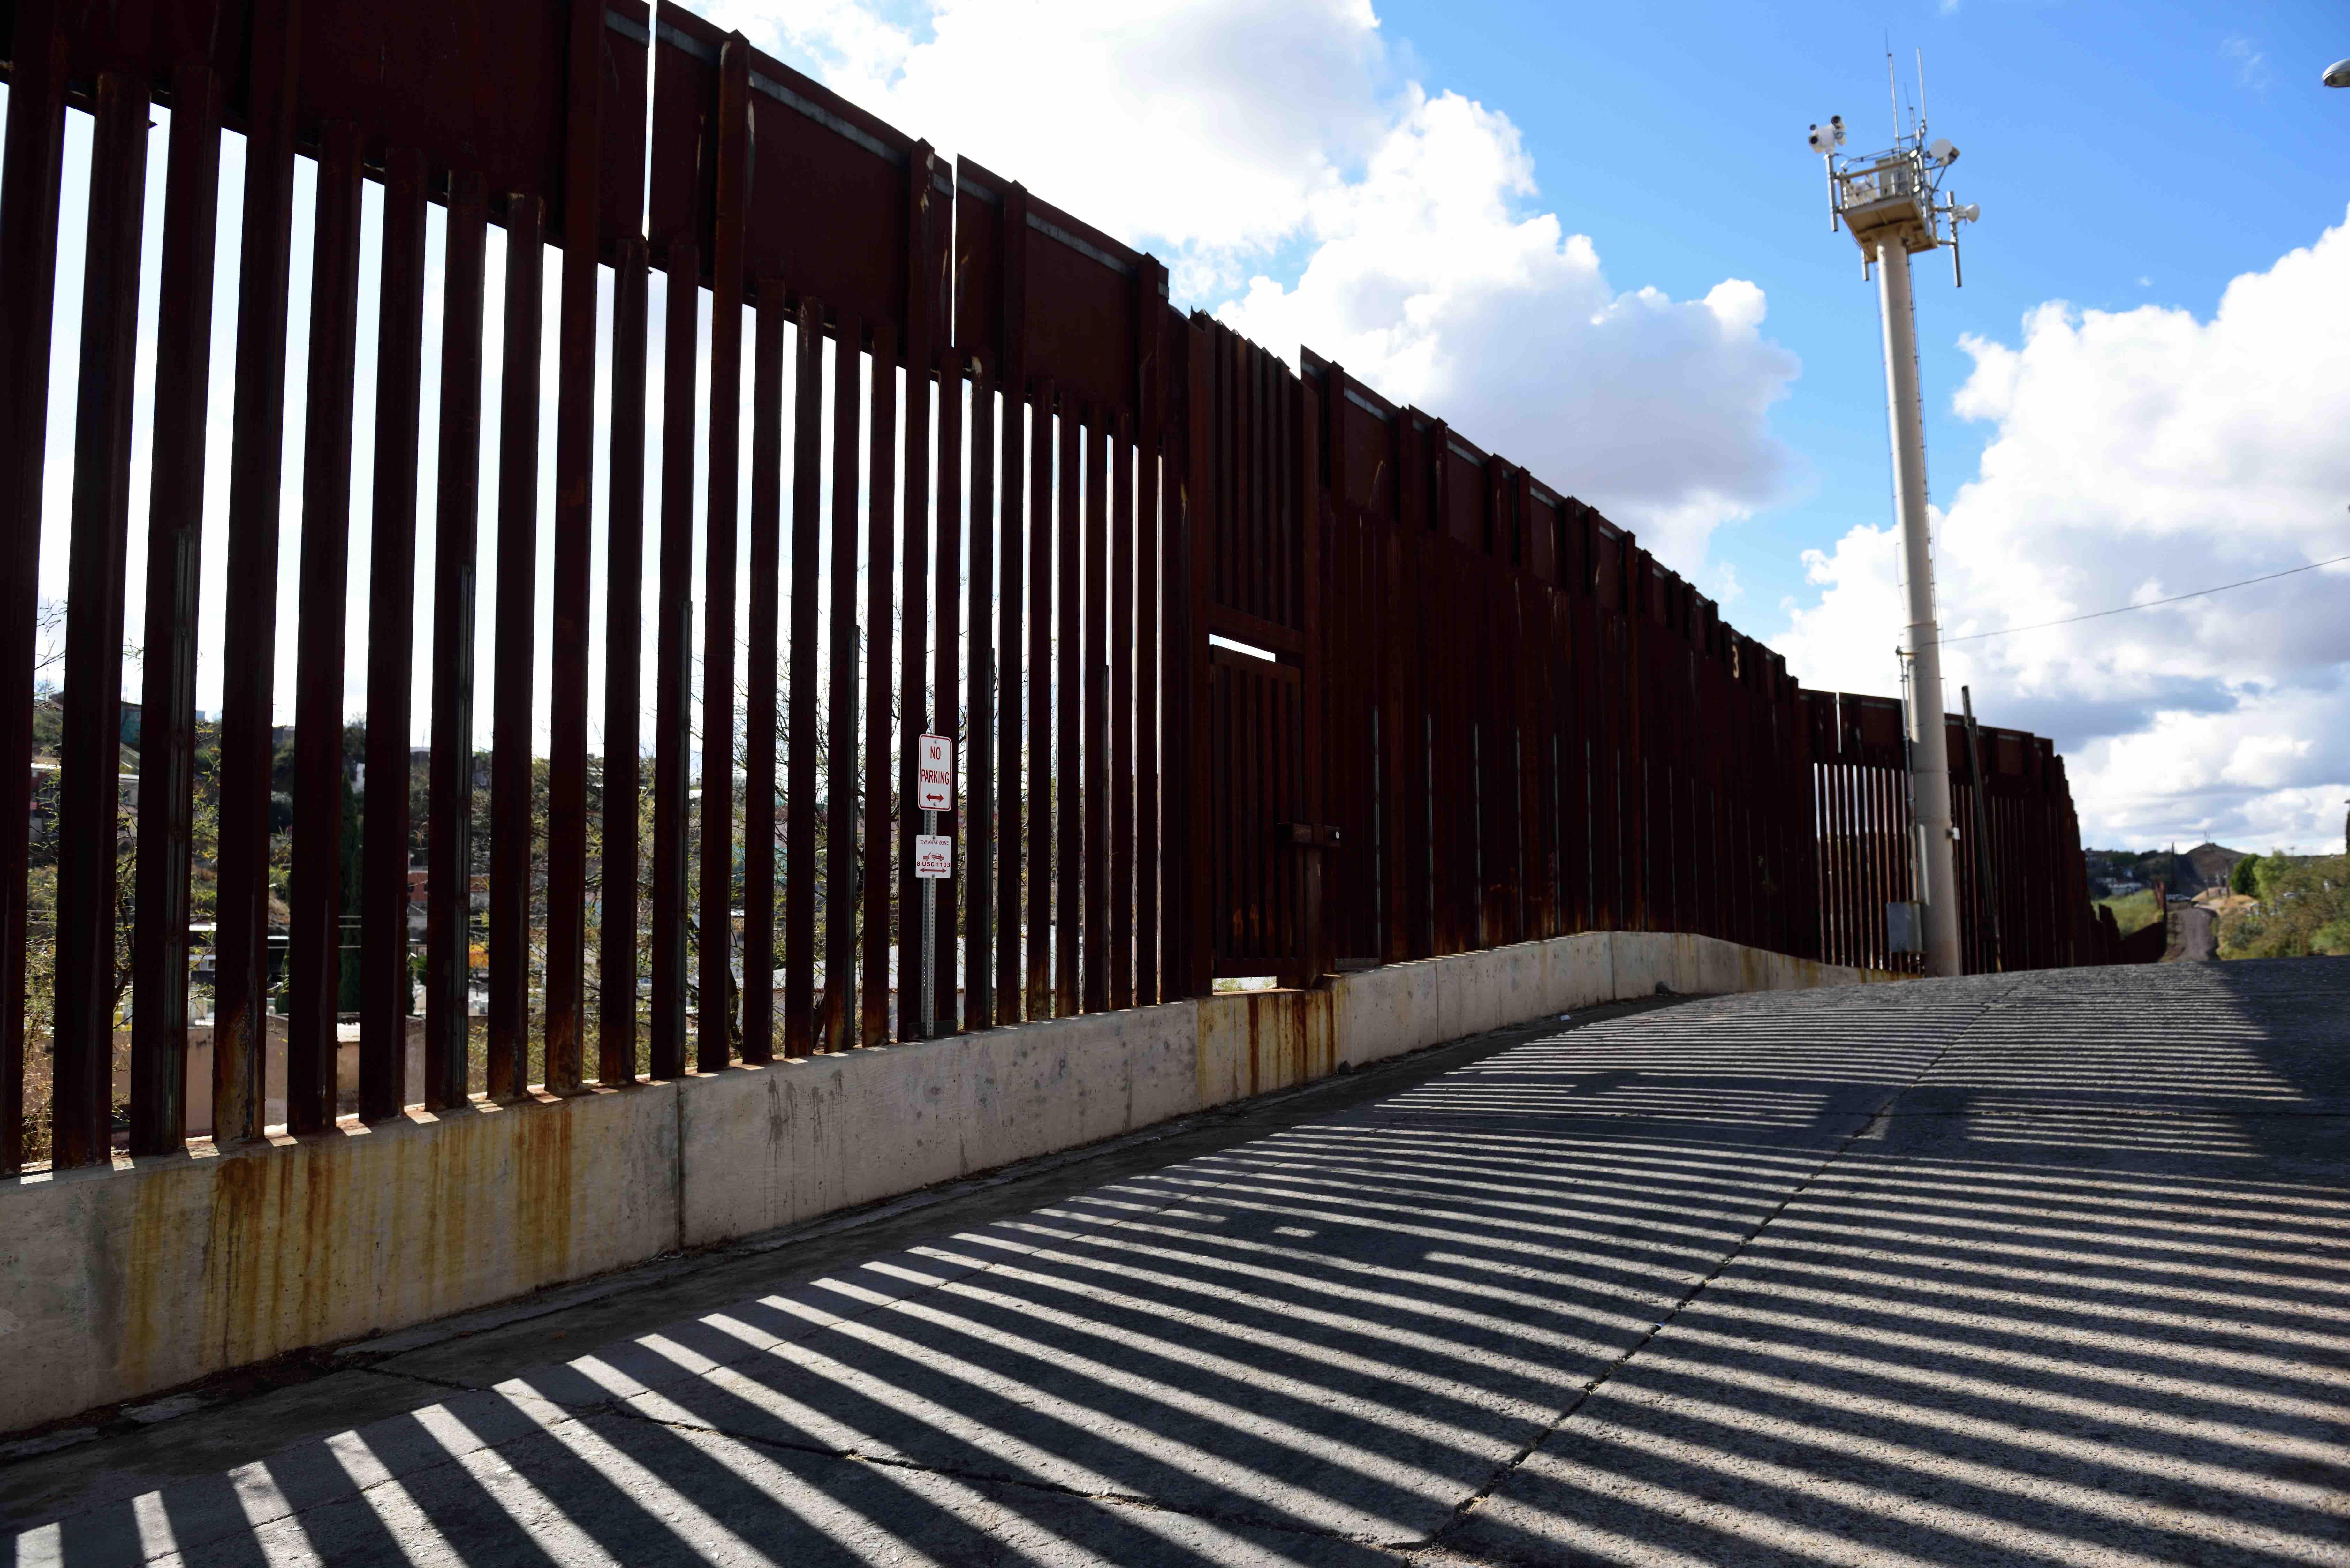 Asylum Seekers Take Over Bridge Along the Texas-Mexico Border